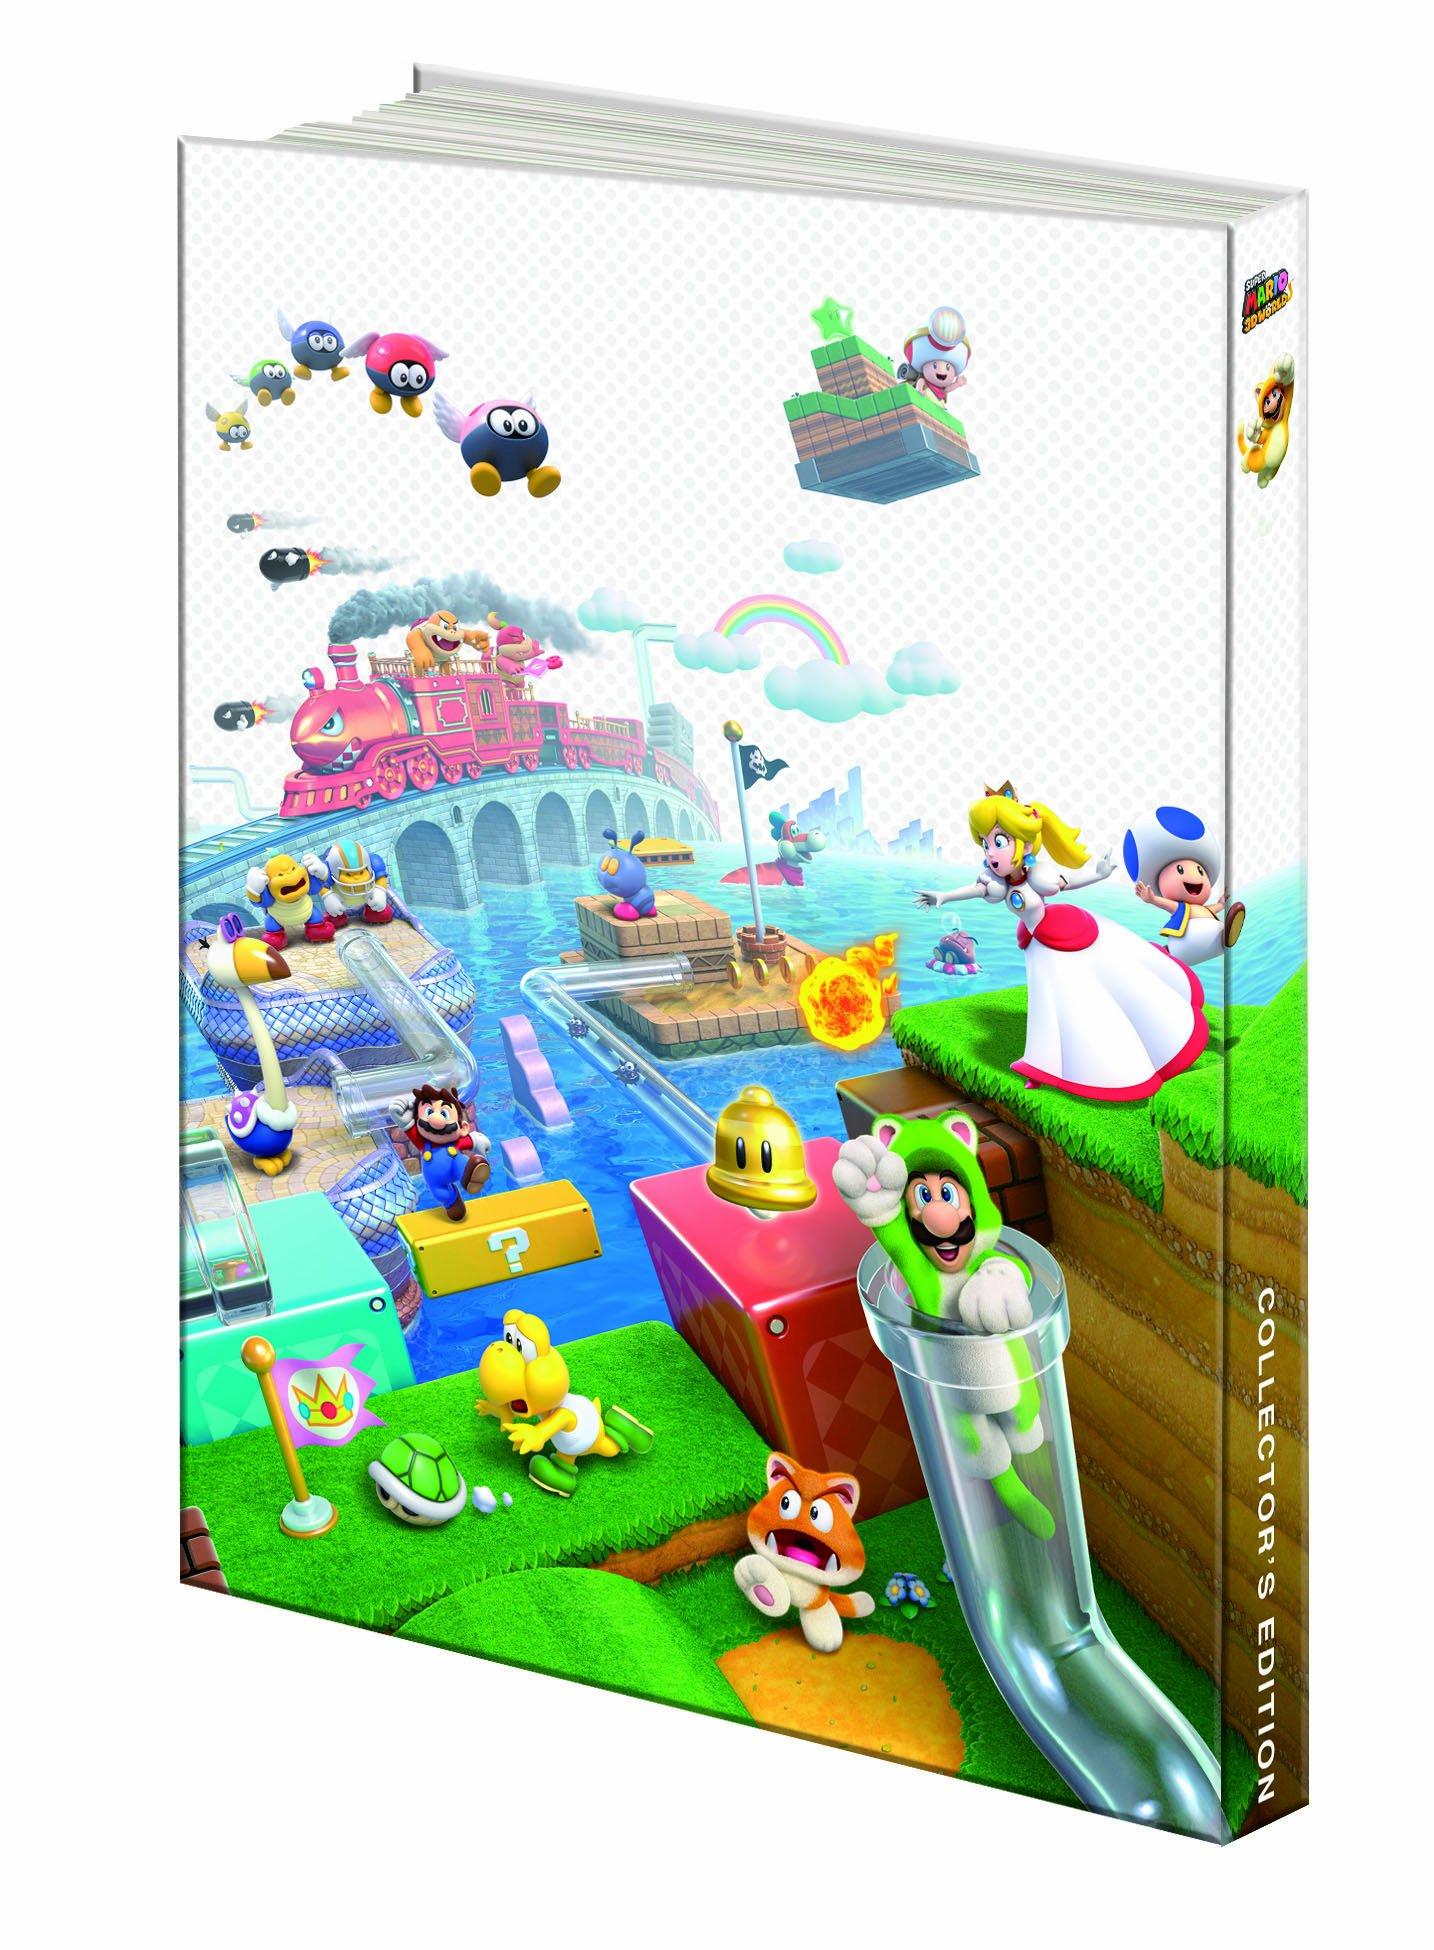 super mario 3d world collector s edition prima official game guide rh amazon com super mario 3d world wiki guide super mario 3d world guide book